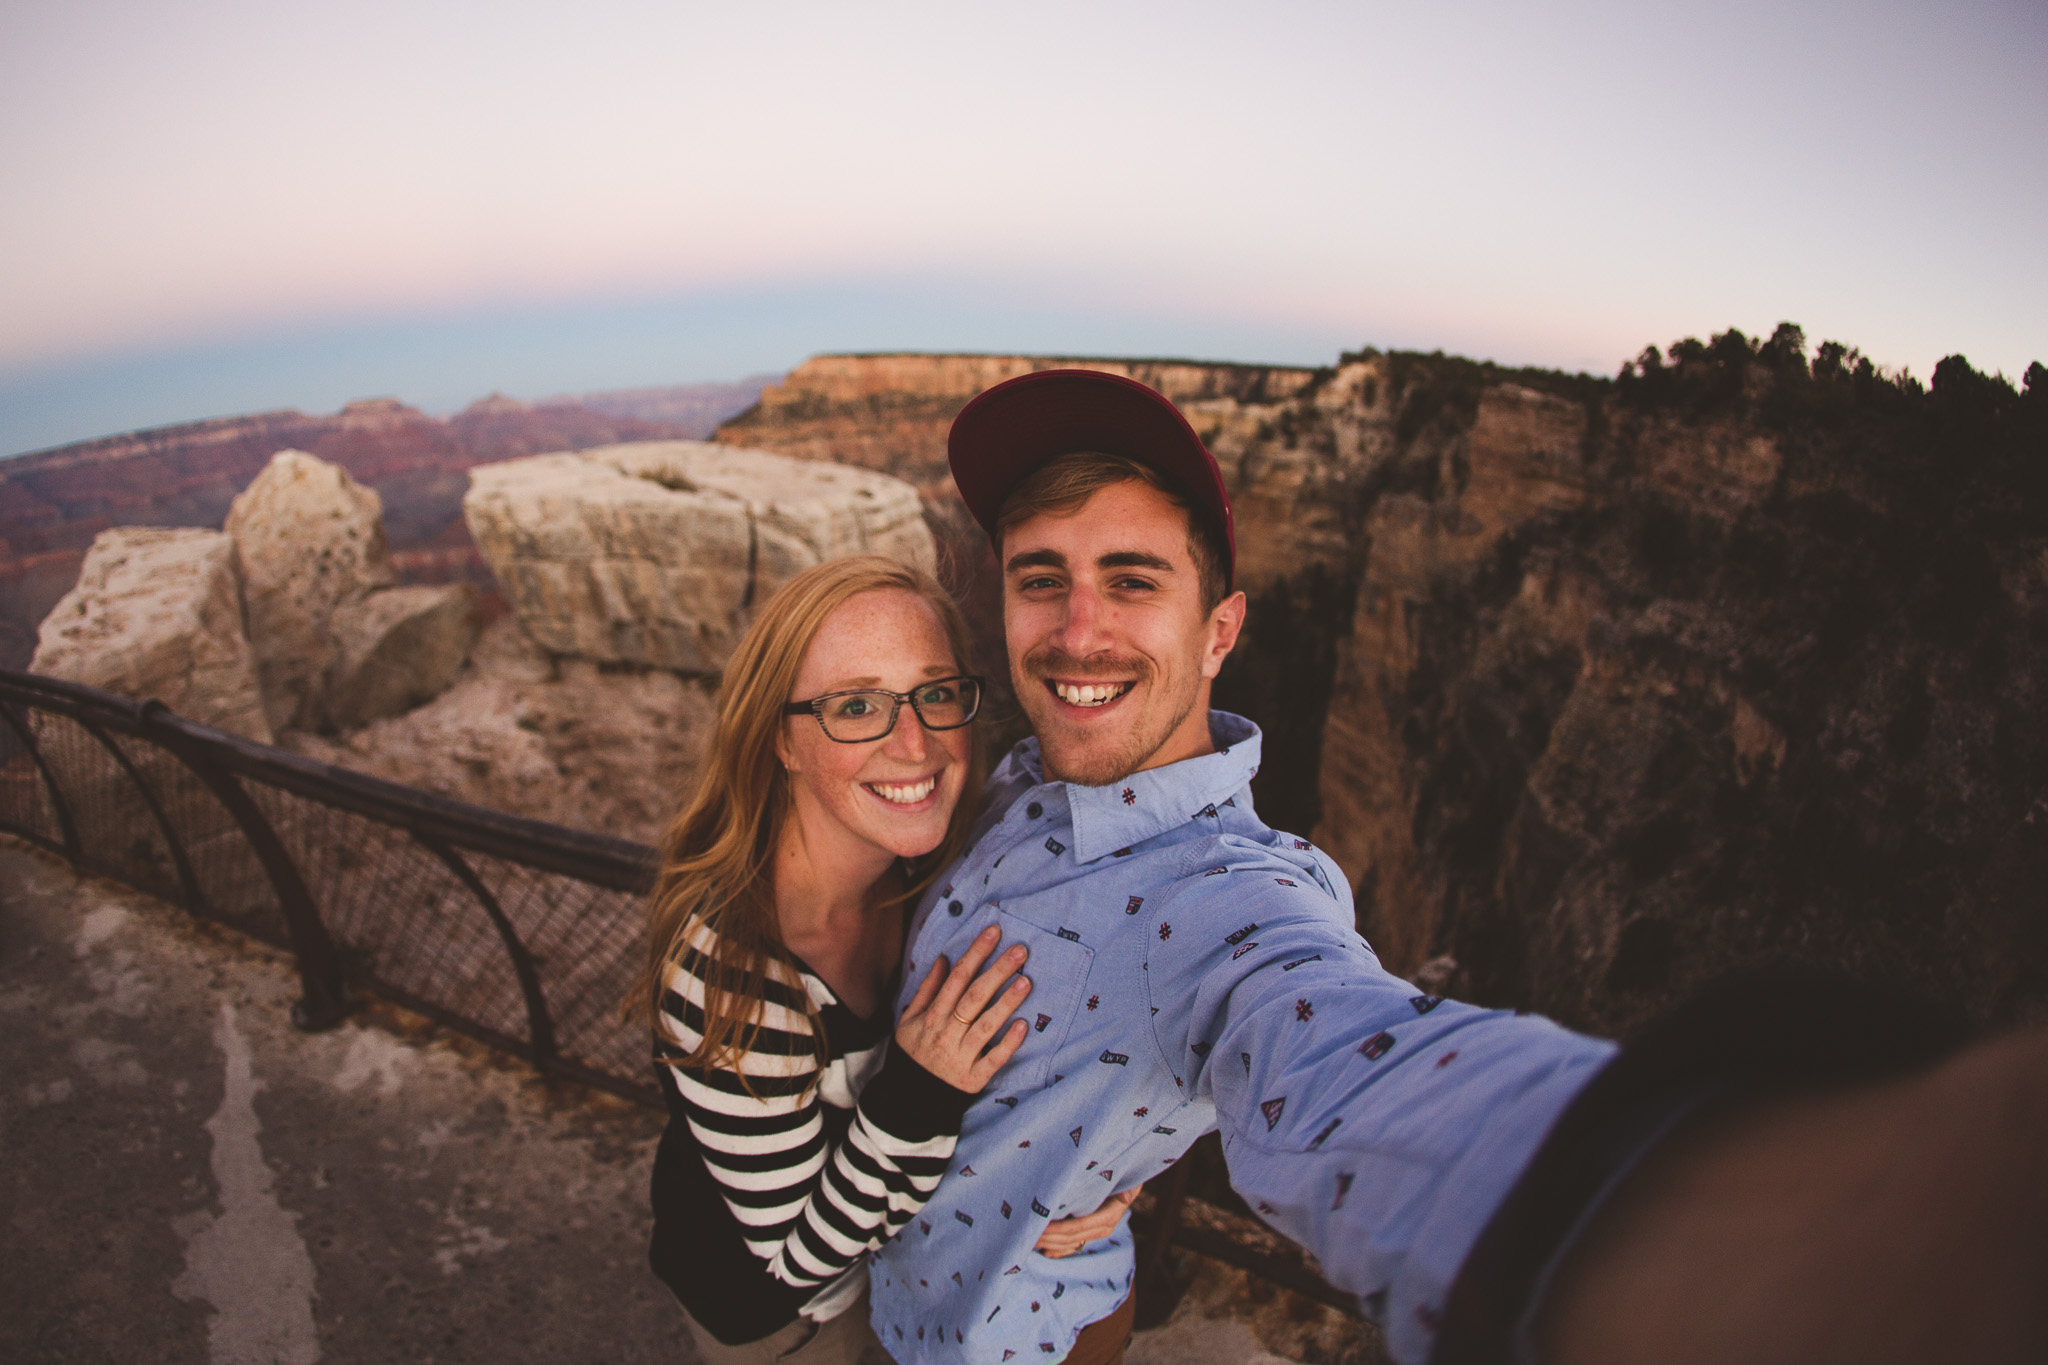 Grand-canyon-fisheye-selfie